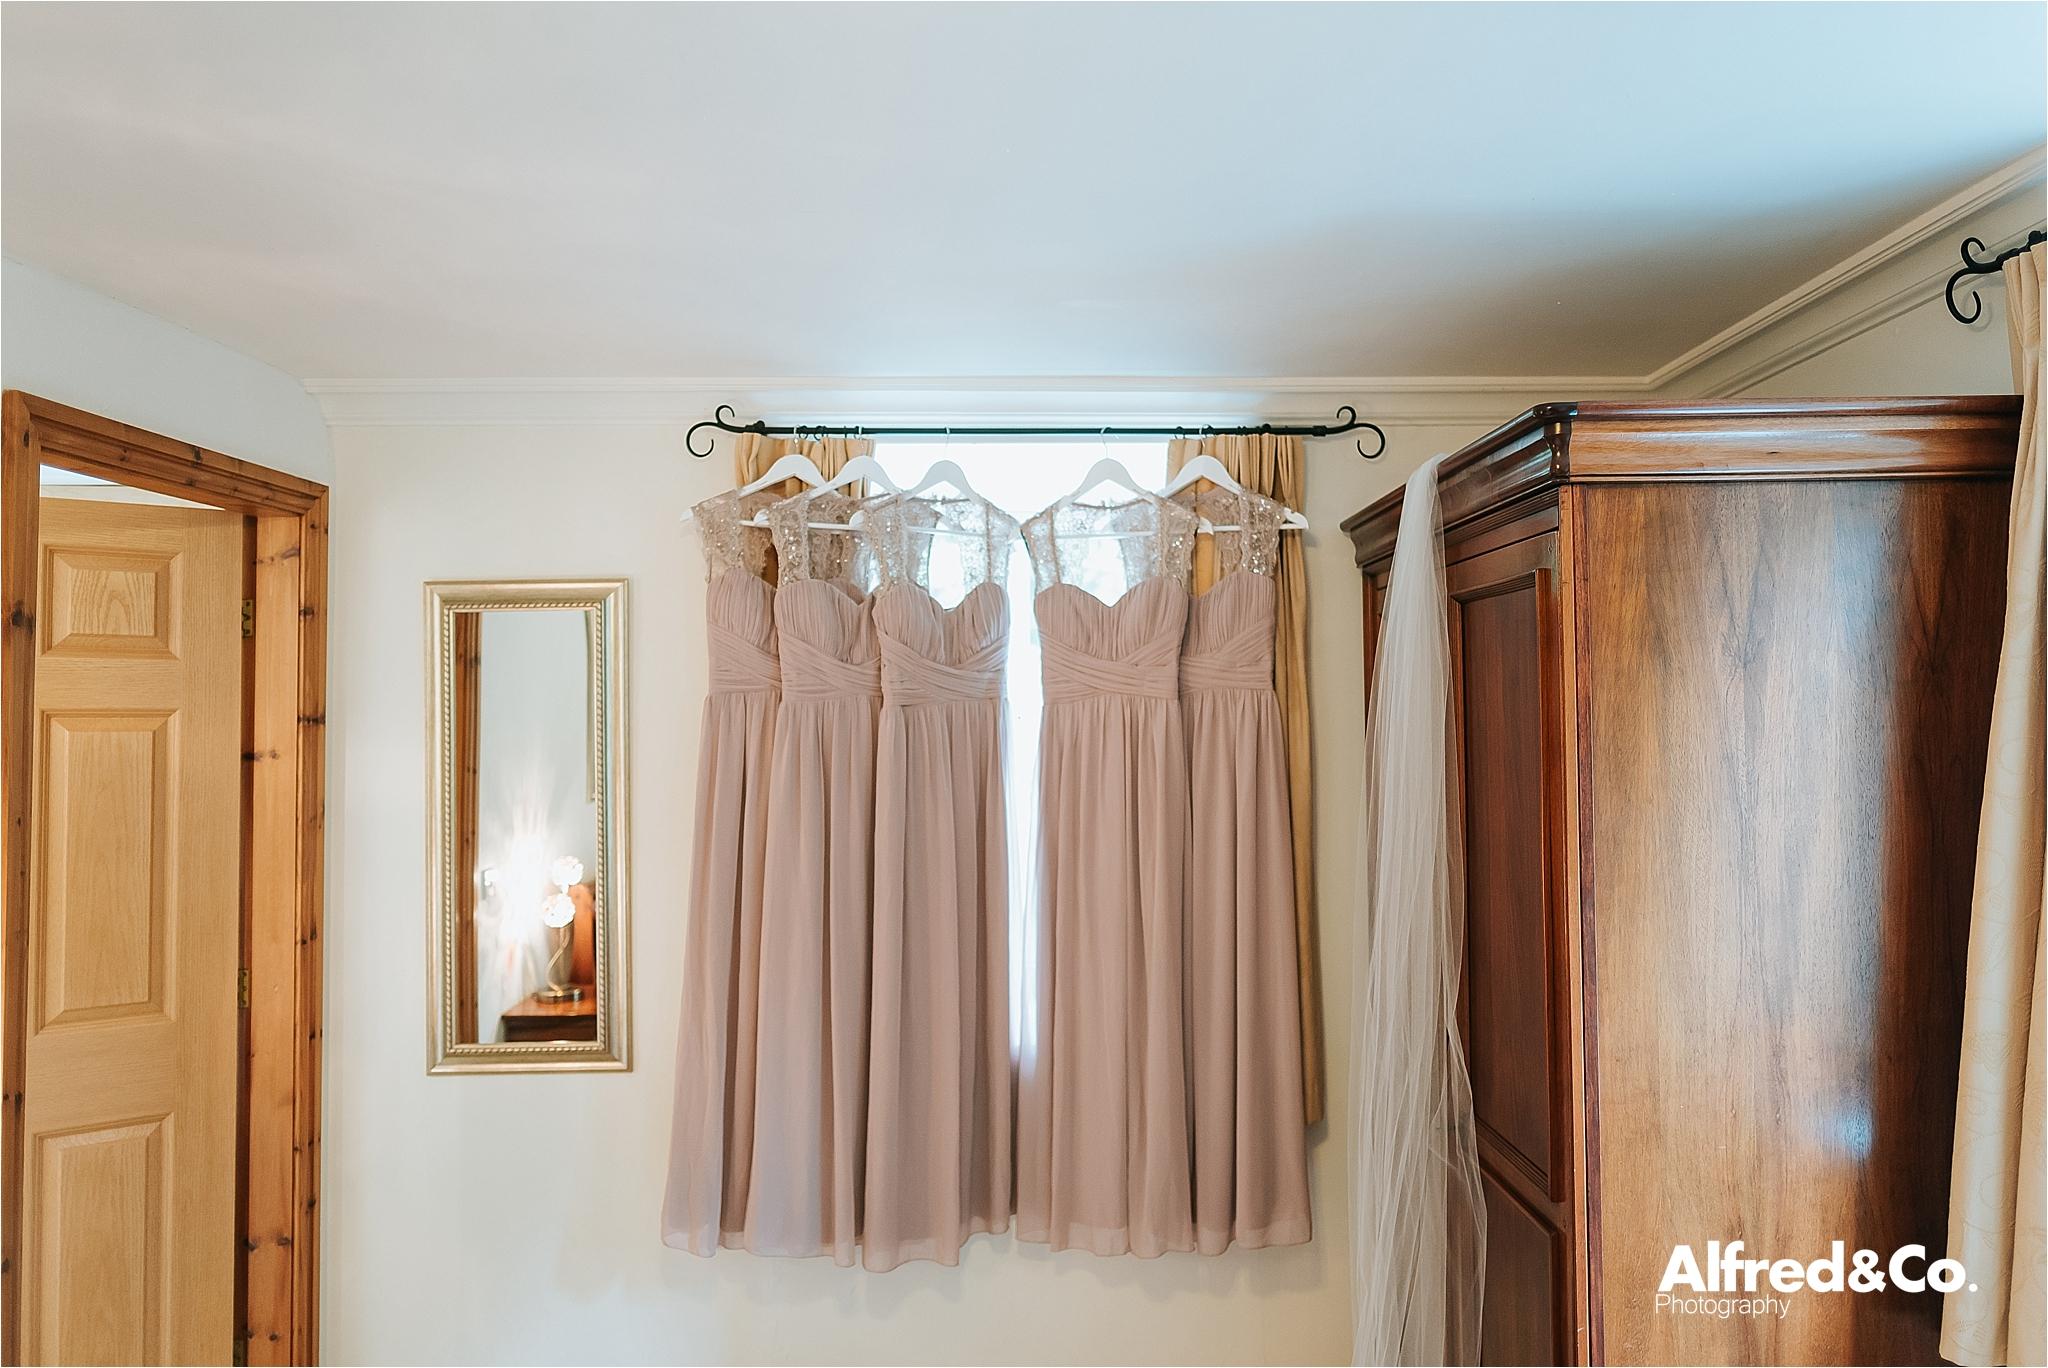 bridesmaids dresses hanging in window